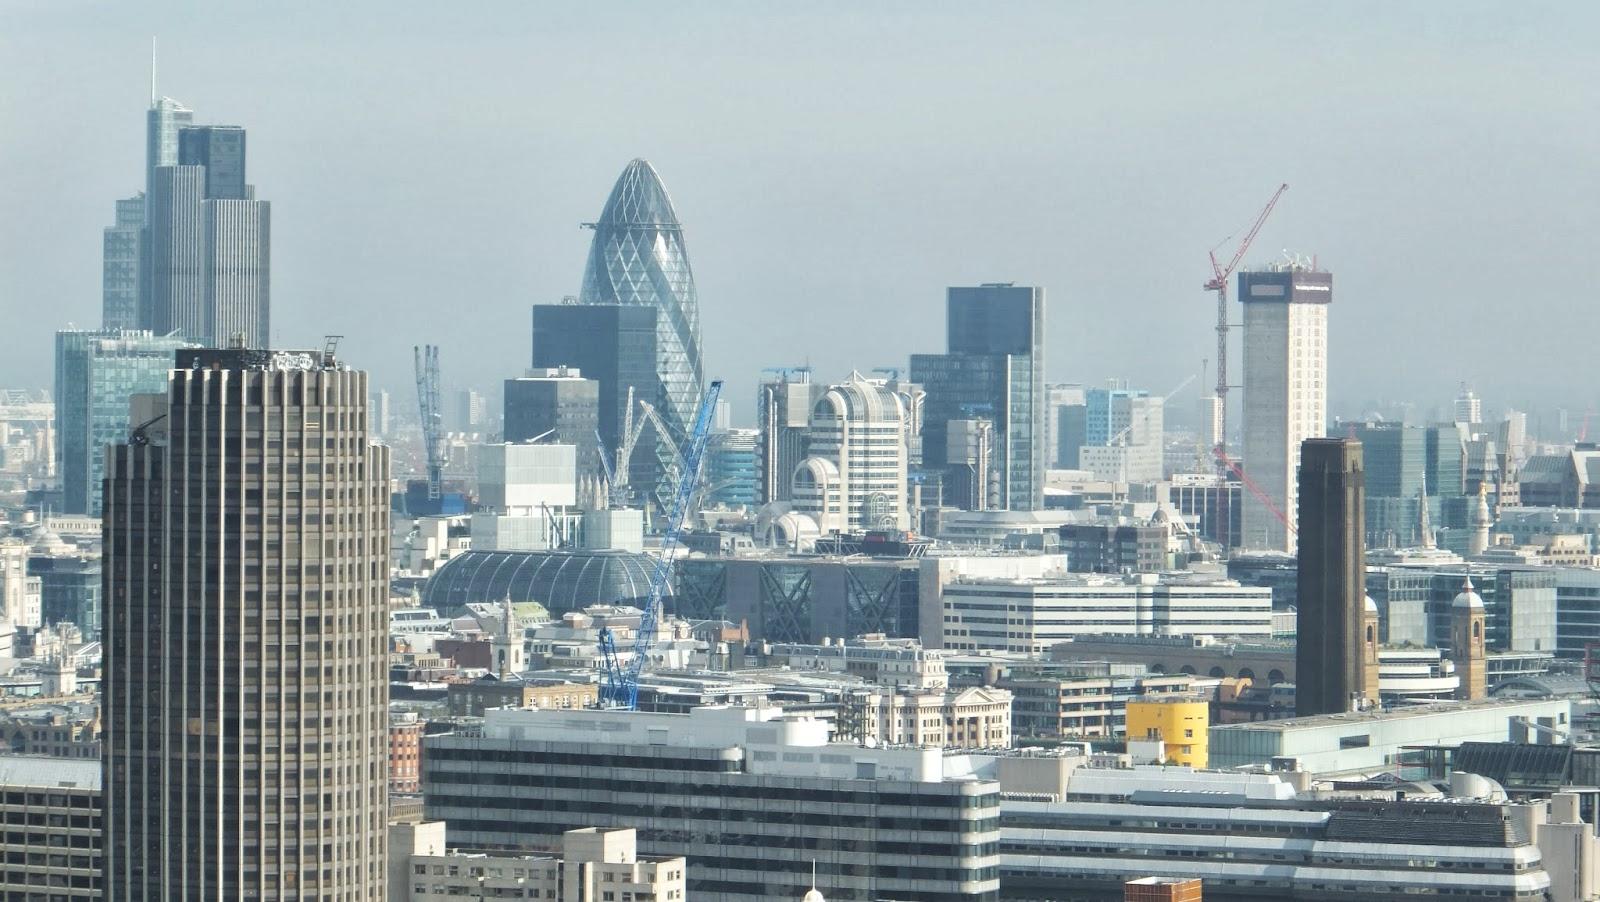 London Eye, Millenium Wheel, Londres, London, Elisa N, Blog de Viajes, Lifestyle, Travel, Ojo de Londres